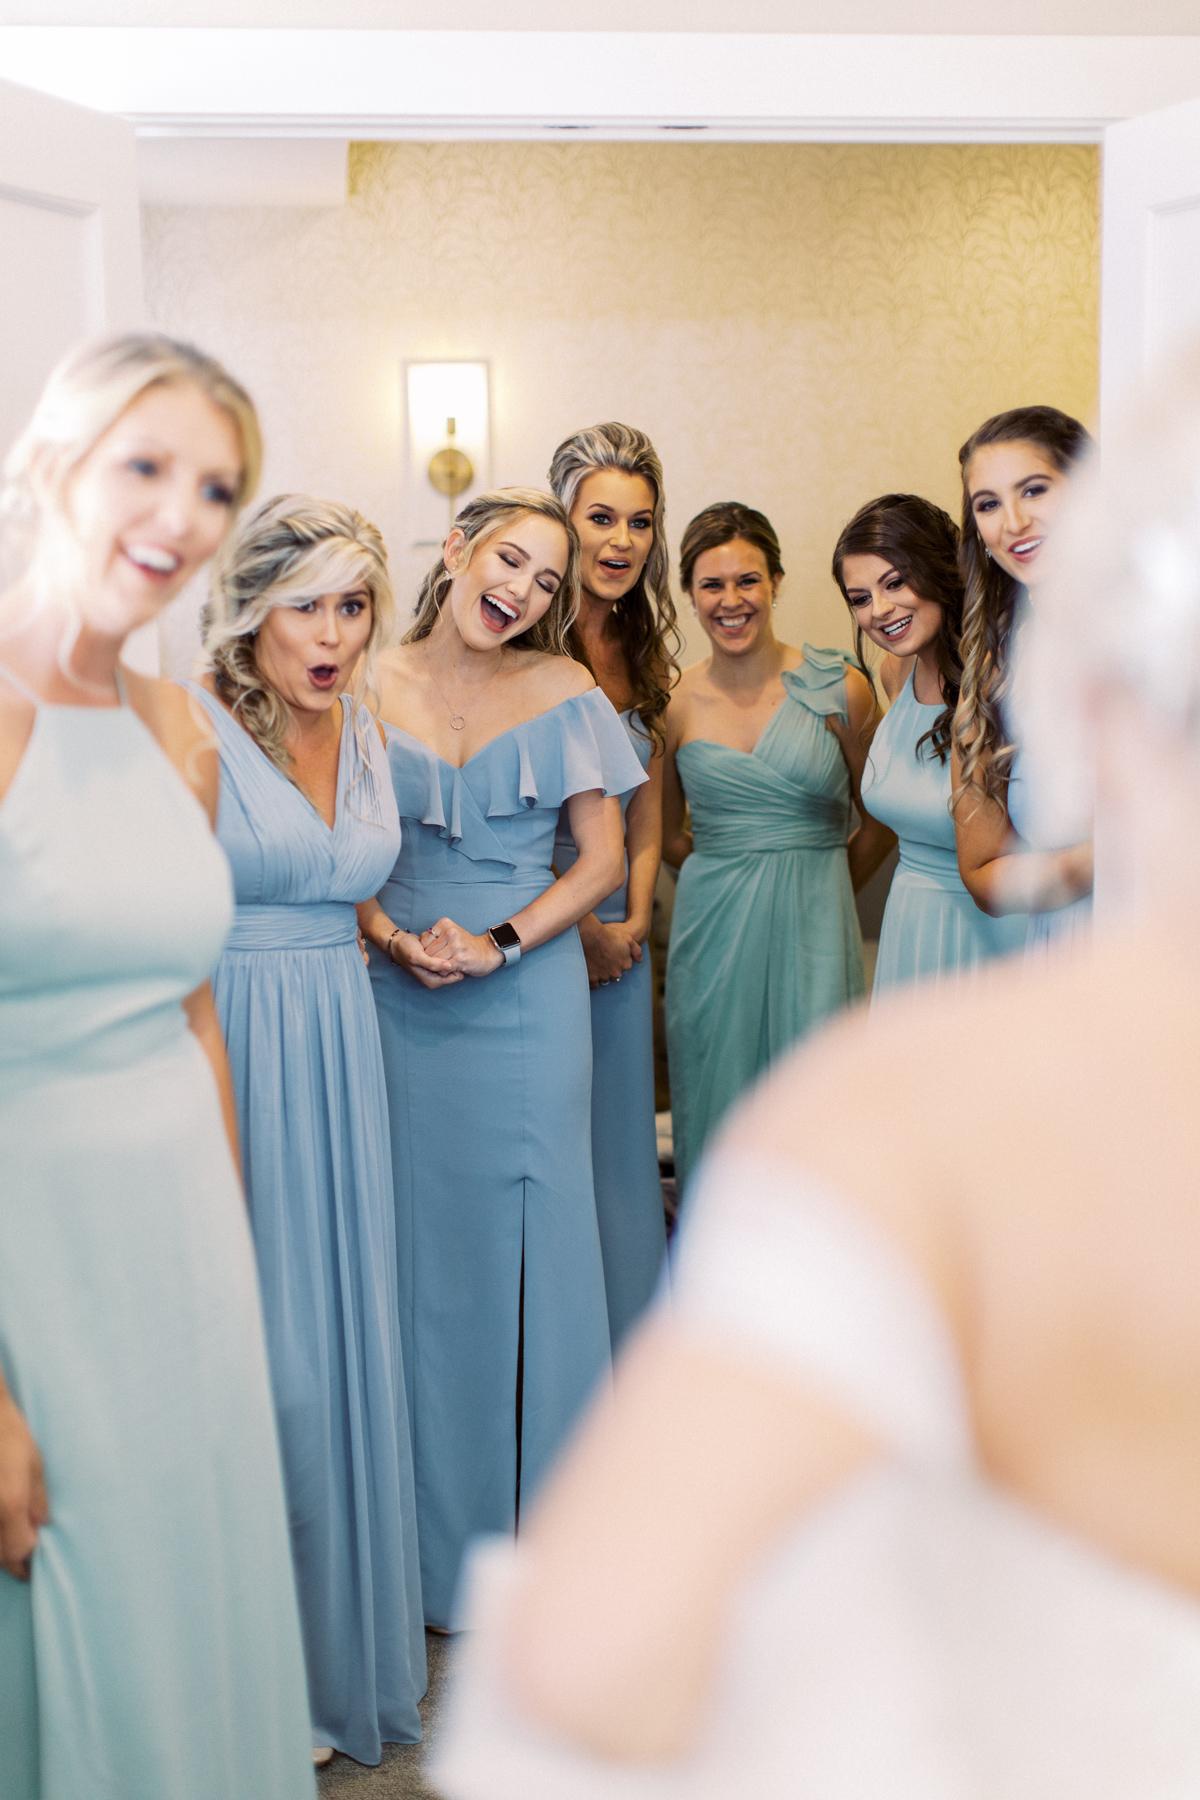 winmock-kinderton-wedding-007.jpg